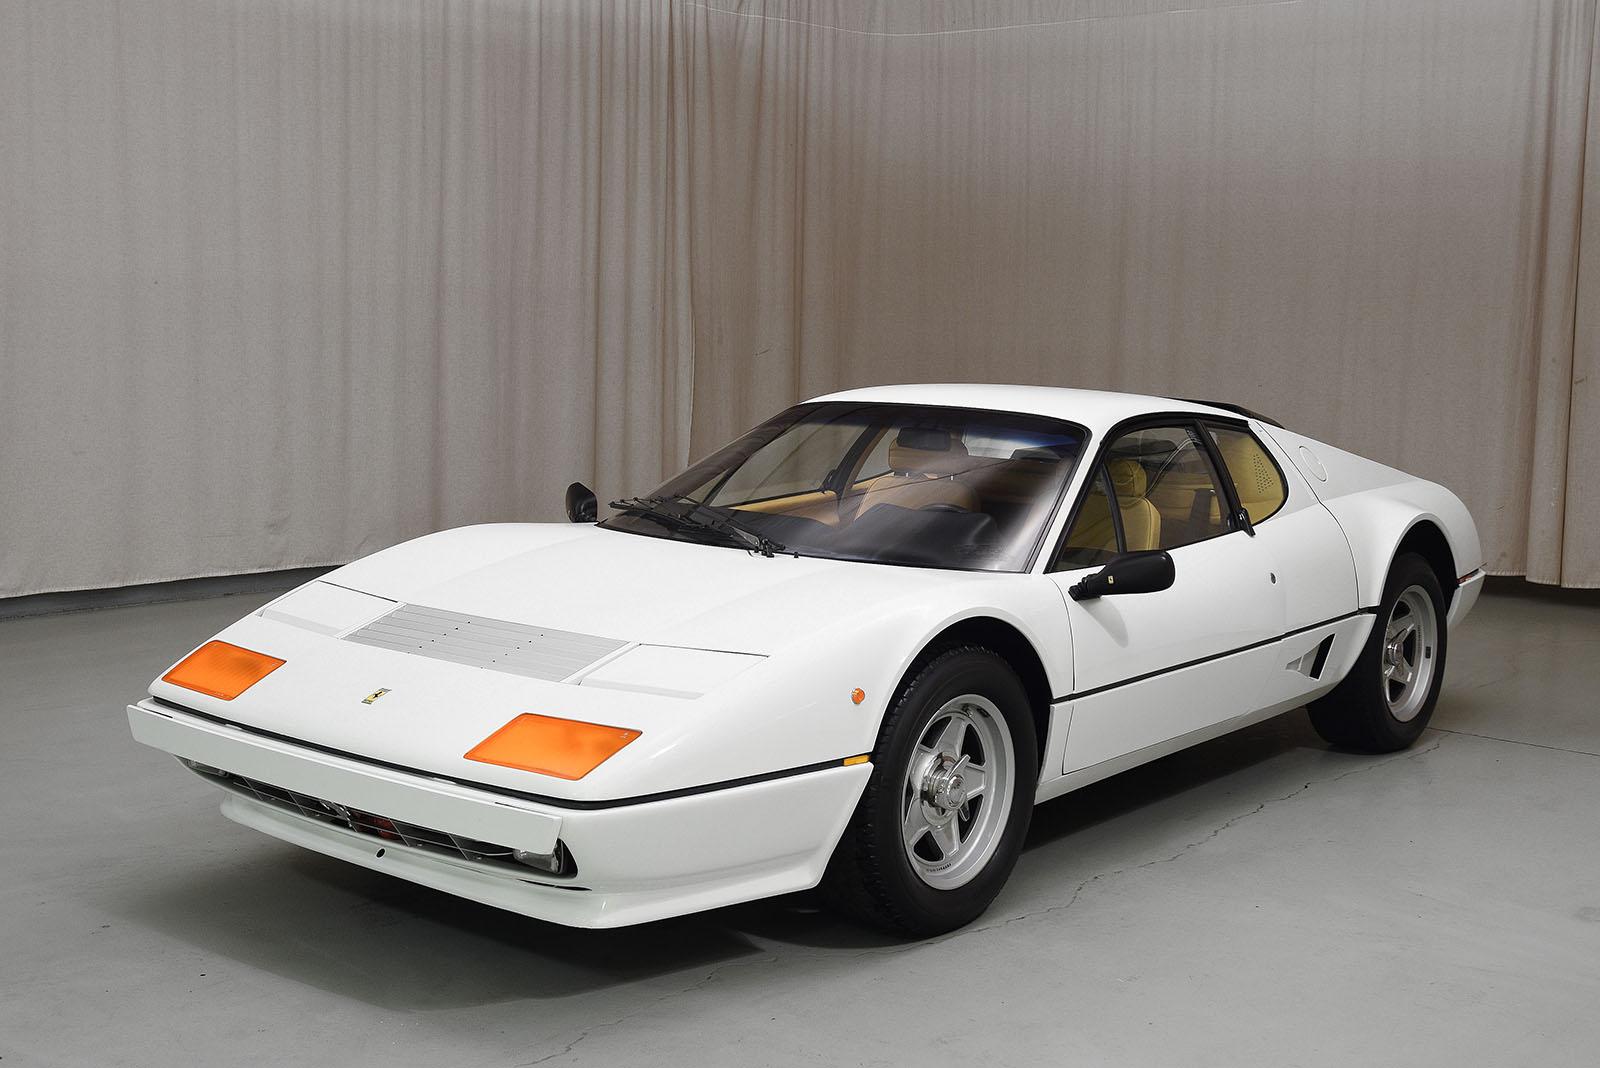 1983 Ferrari 512 Bbi Coupe Sold By Hyman Ltd Classic Cars